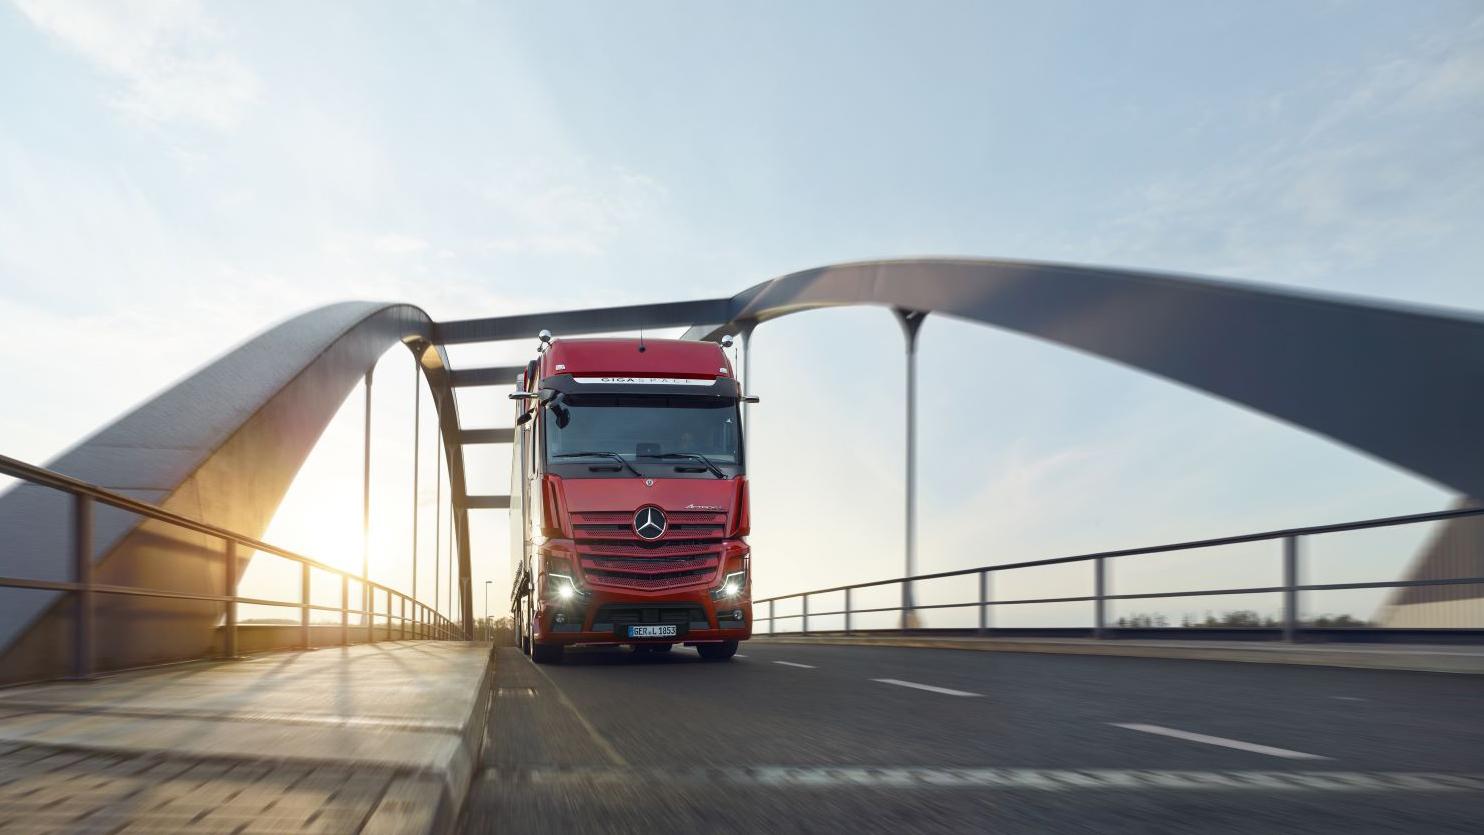 După Actros F, Mercedes-Benz a lansat modelul Actros L